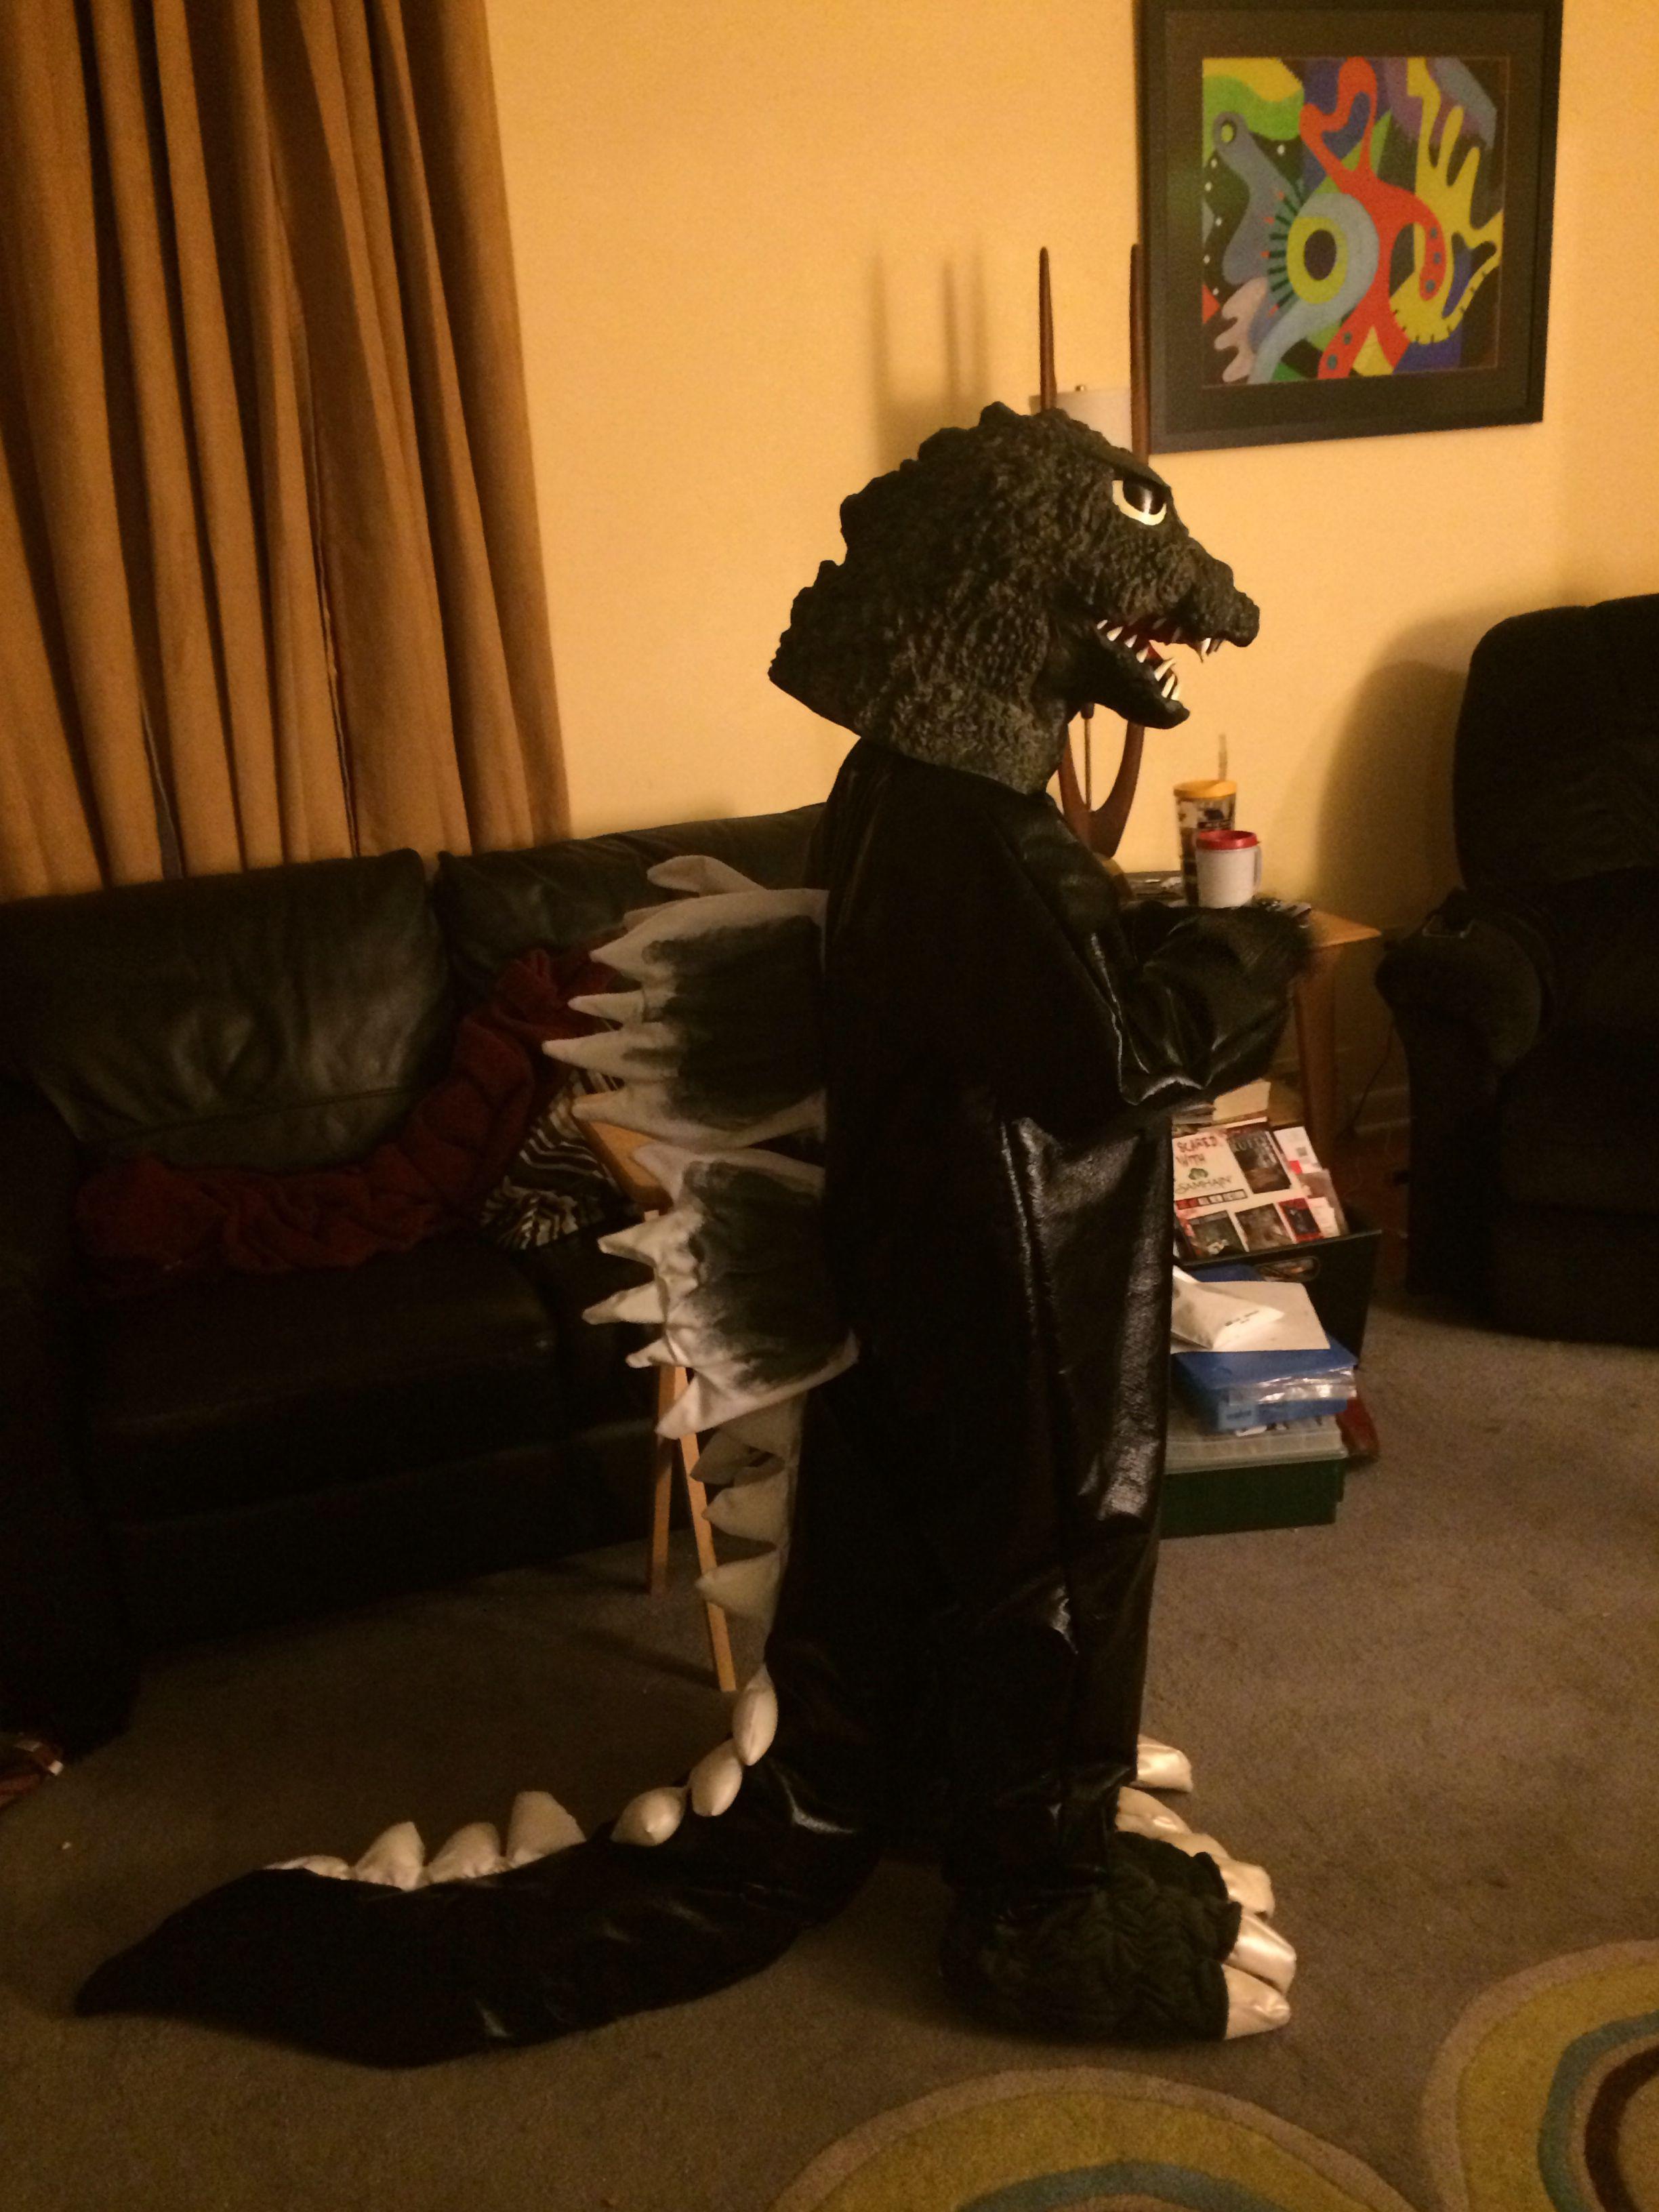 godzilla costume for my son